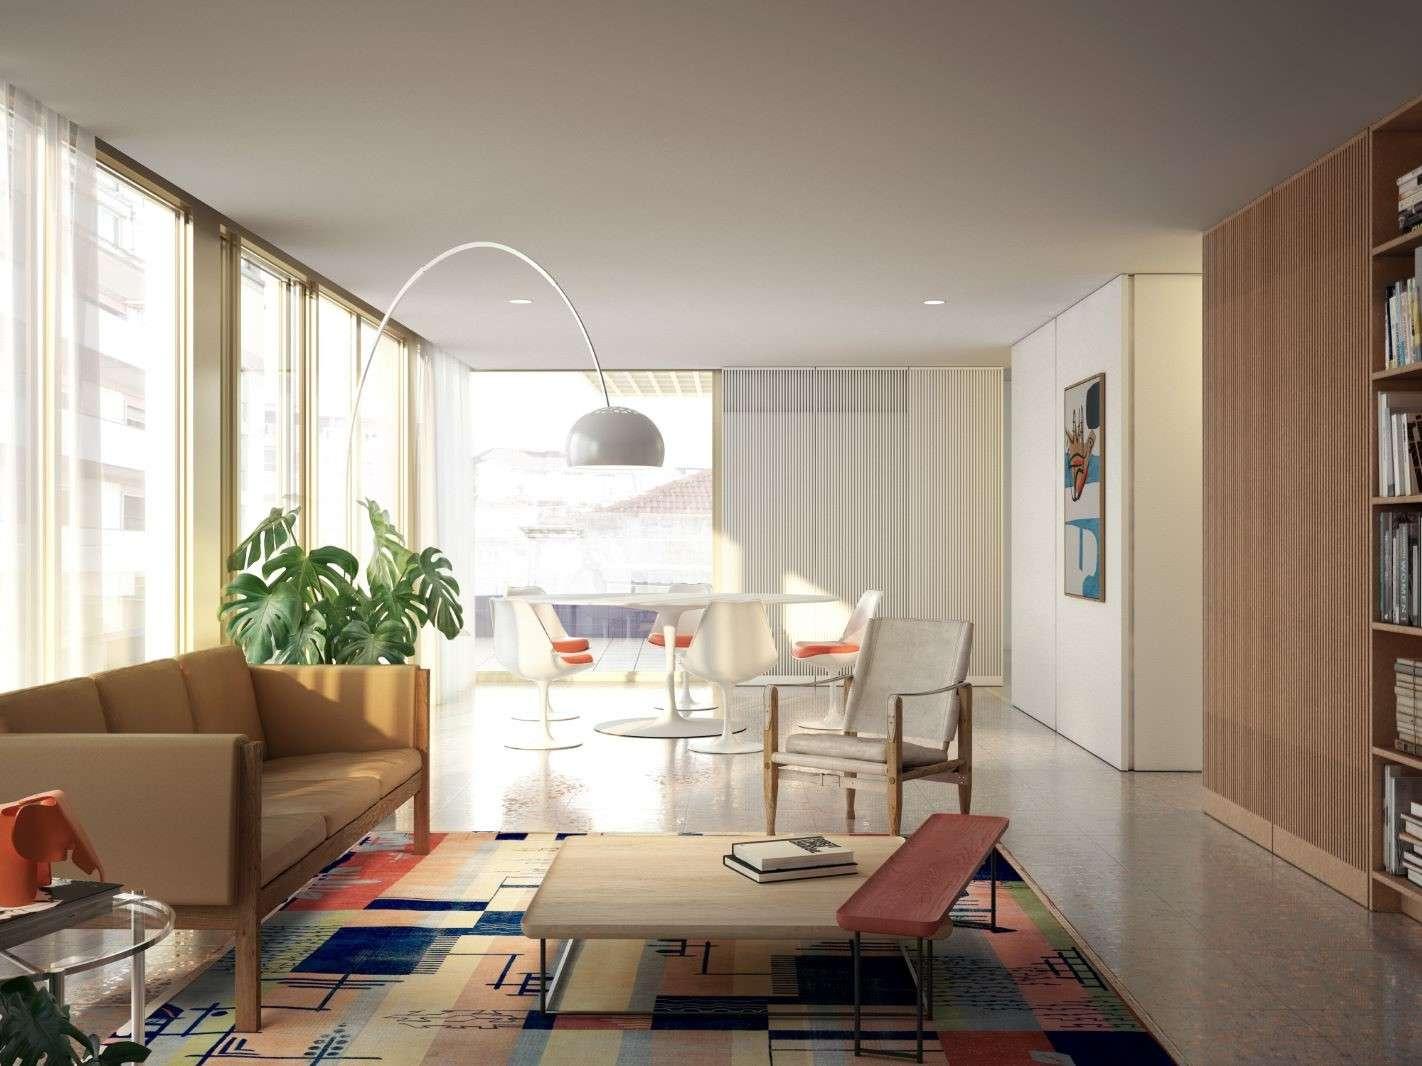 images-prod-prop-004604-sala_apartamento_m_1623936717334-jpg